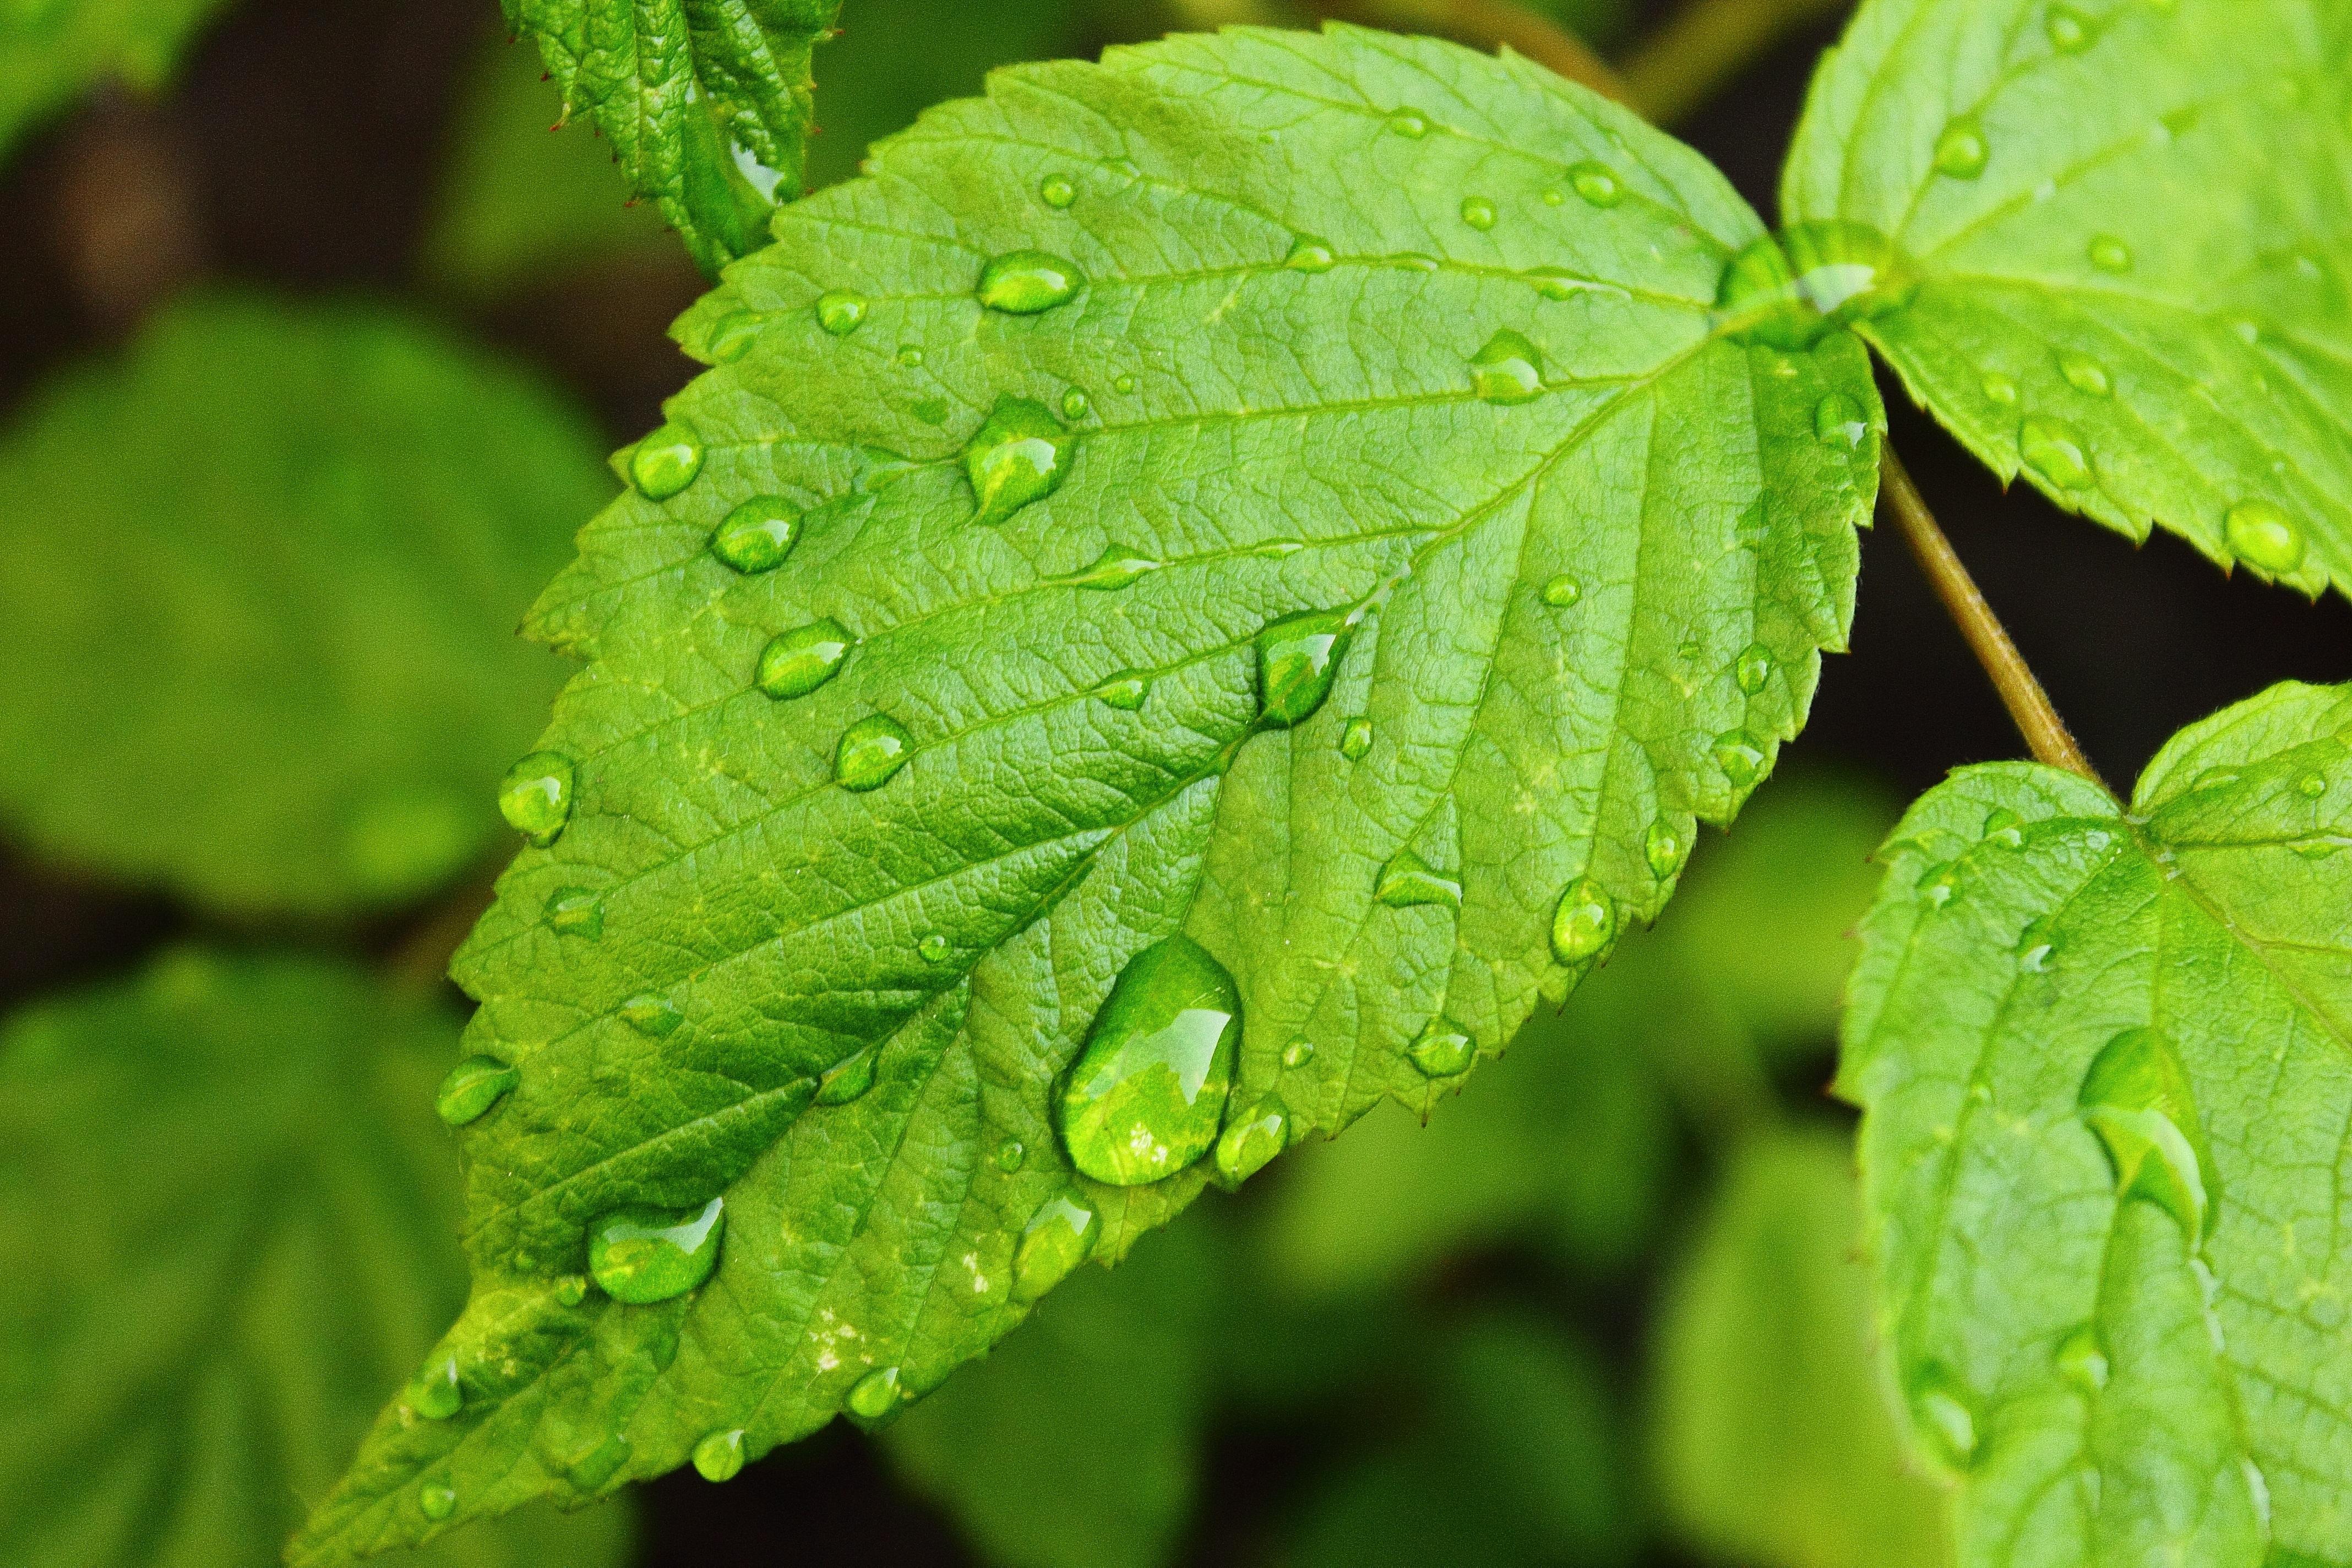 Drops of water on leaf by ChristopherPluta on DeviantArt